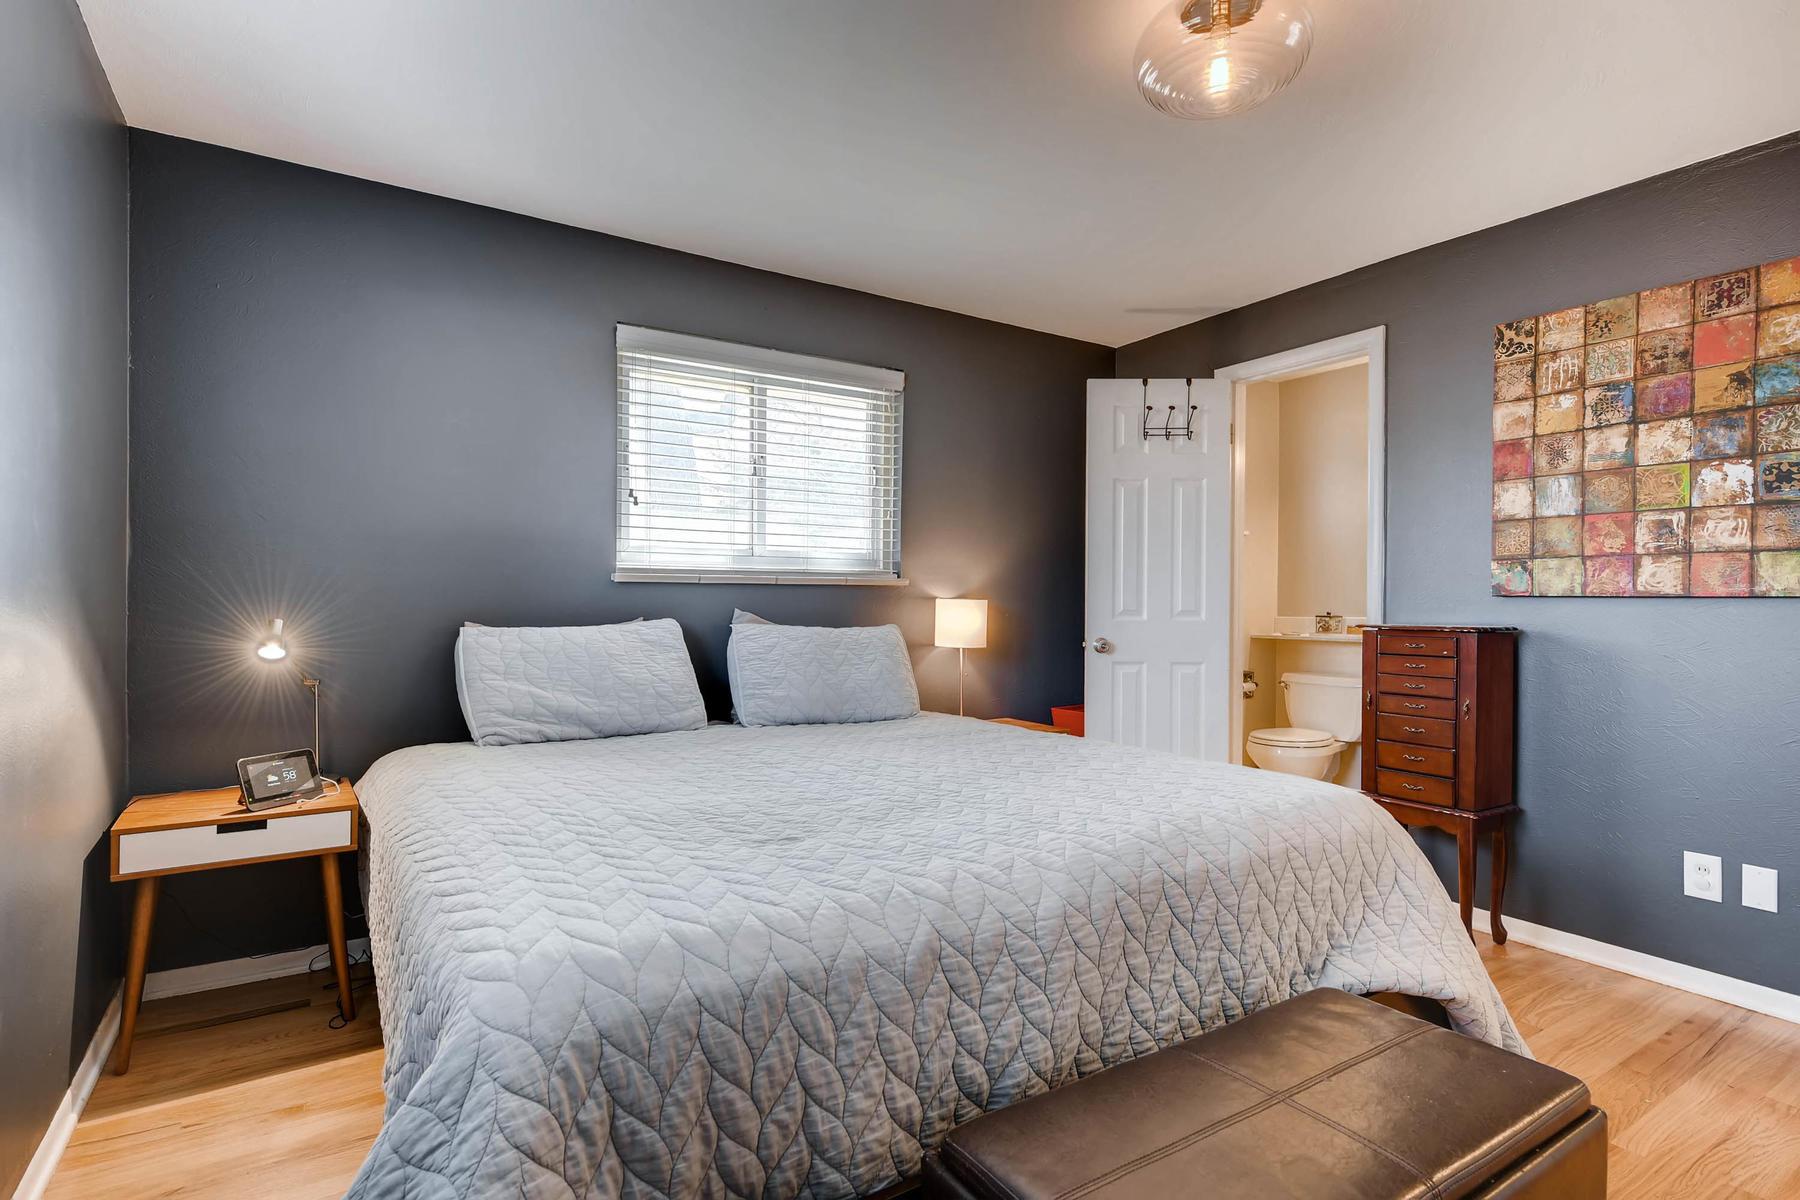 6676 S Kit Carson St-MLS_Size-014-15-Master Bedroom-1800x1200-72dpi.jpg